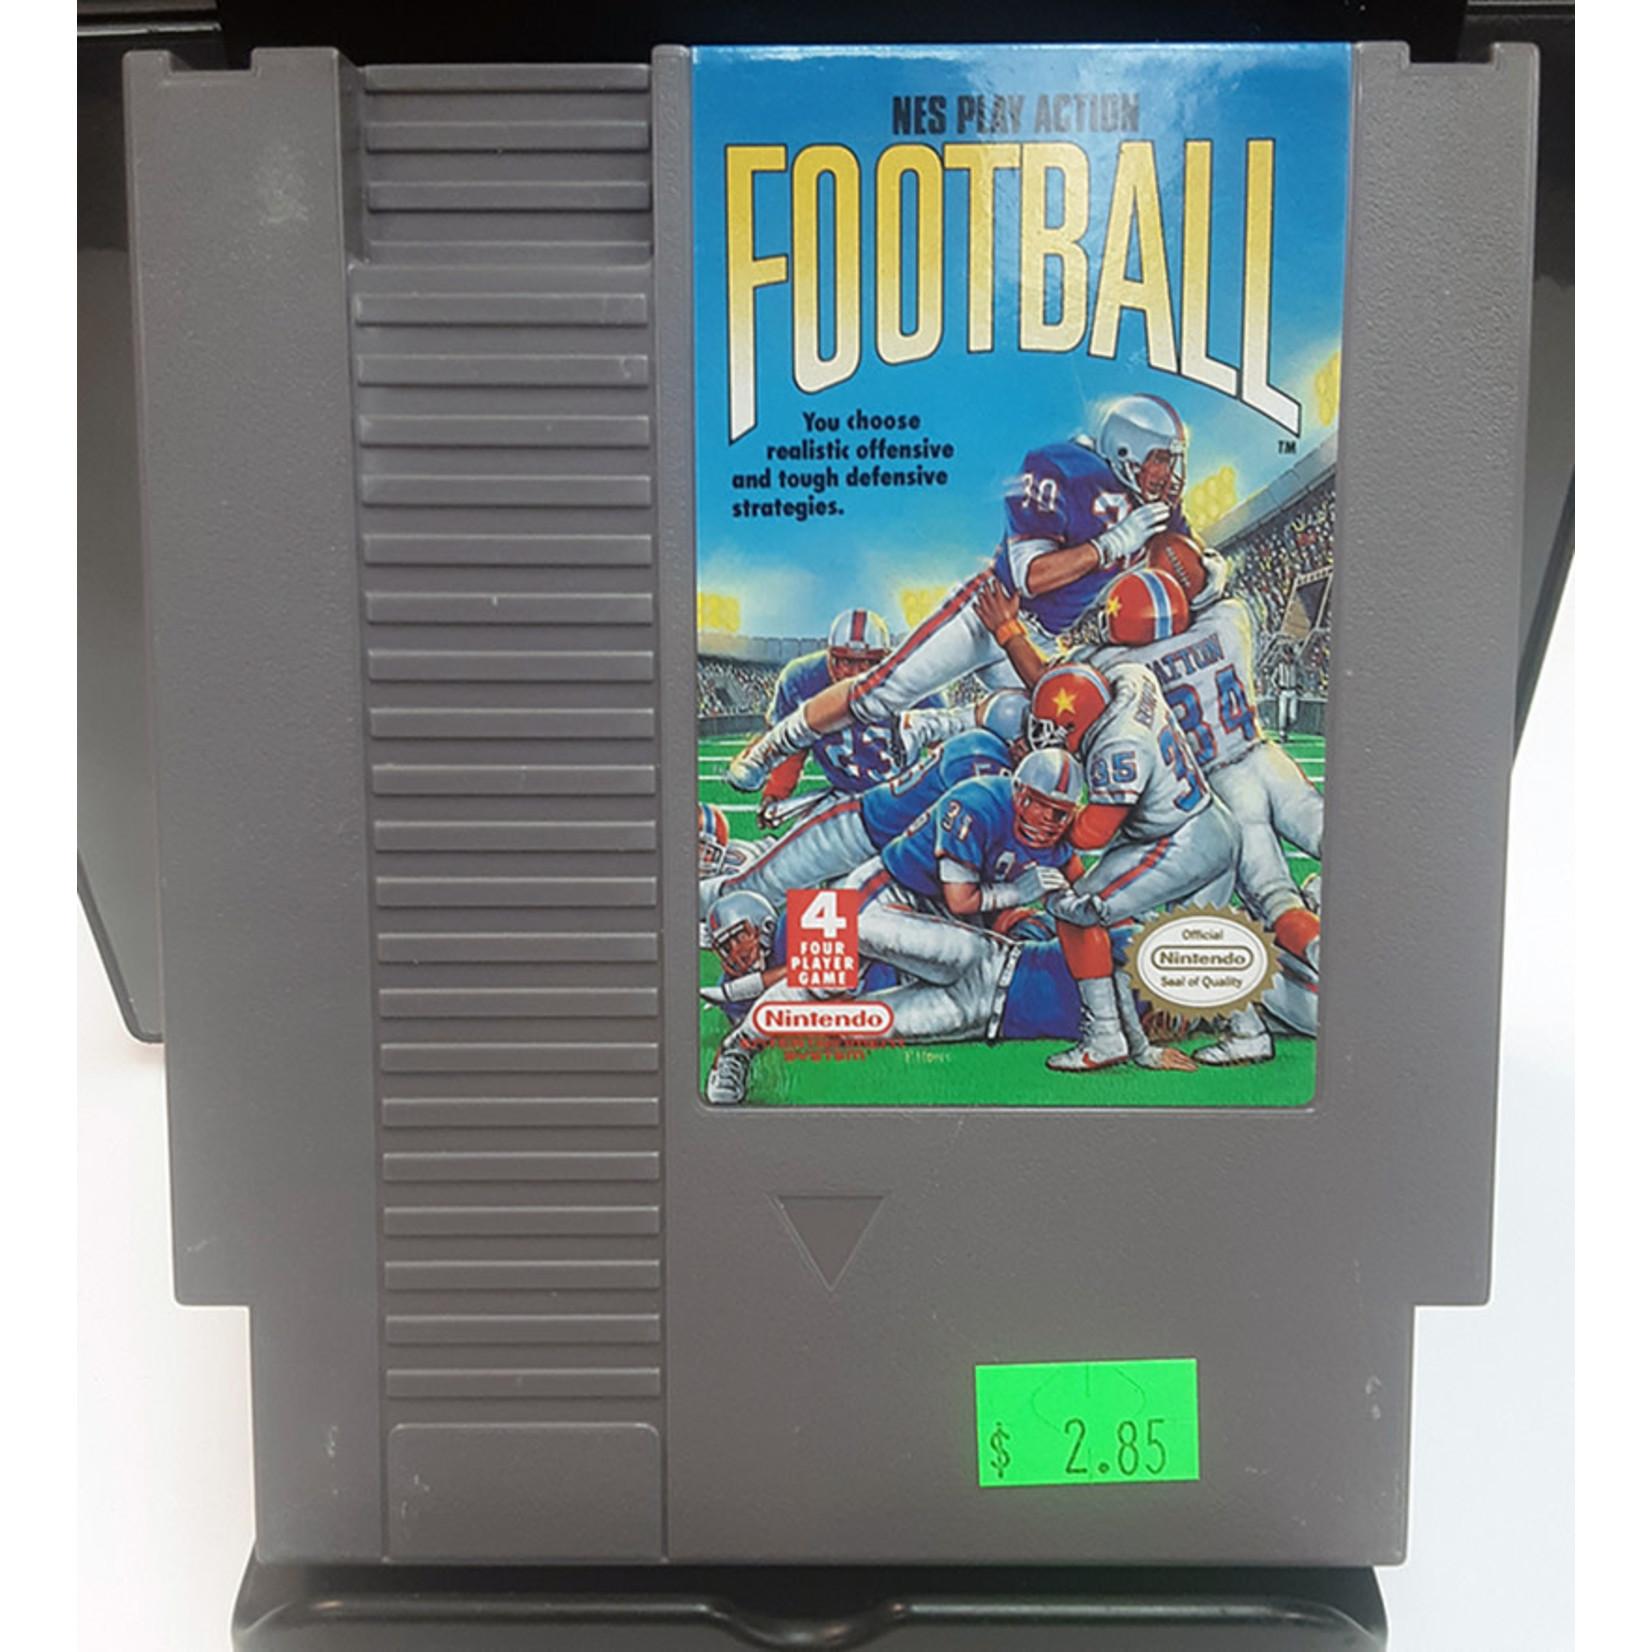 nesu-Play Action Football (cartridge)